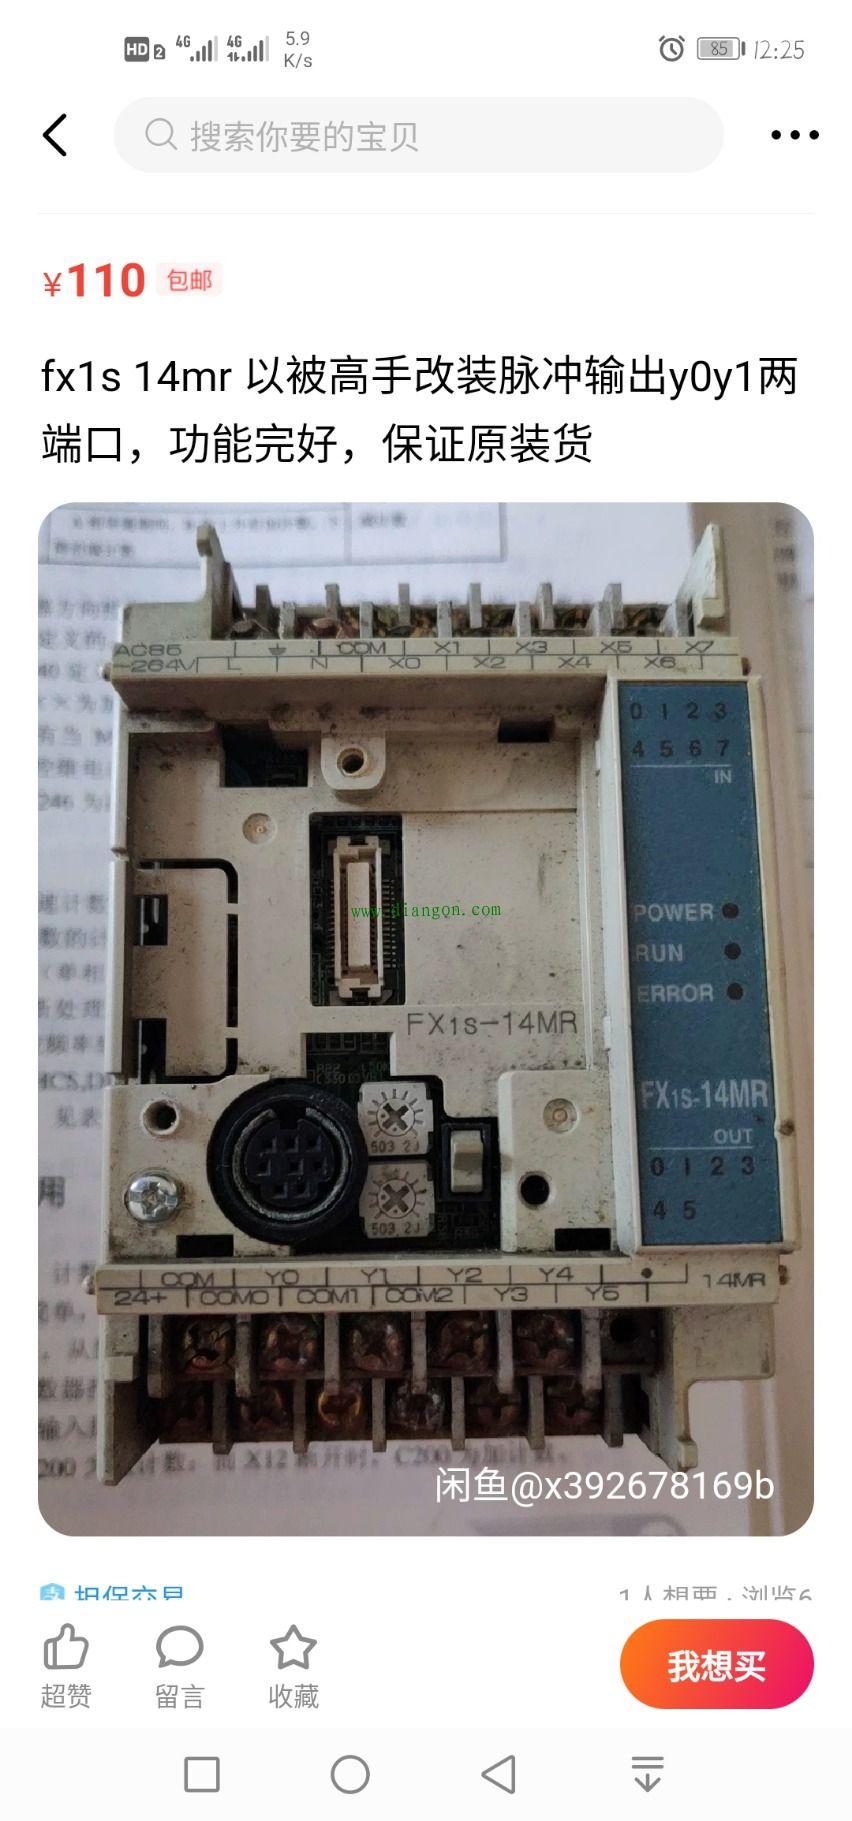 Screenshot_20200104_122526_com.taobao.idlefish.jpg